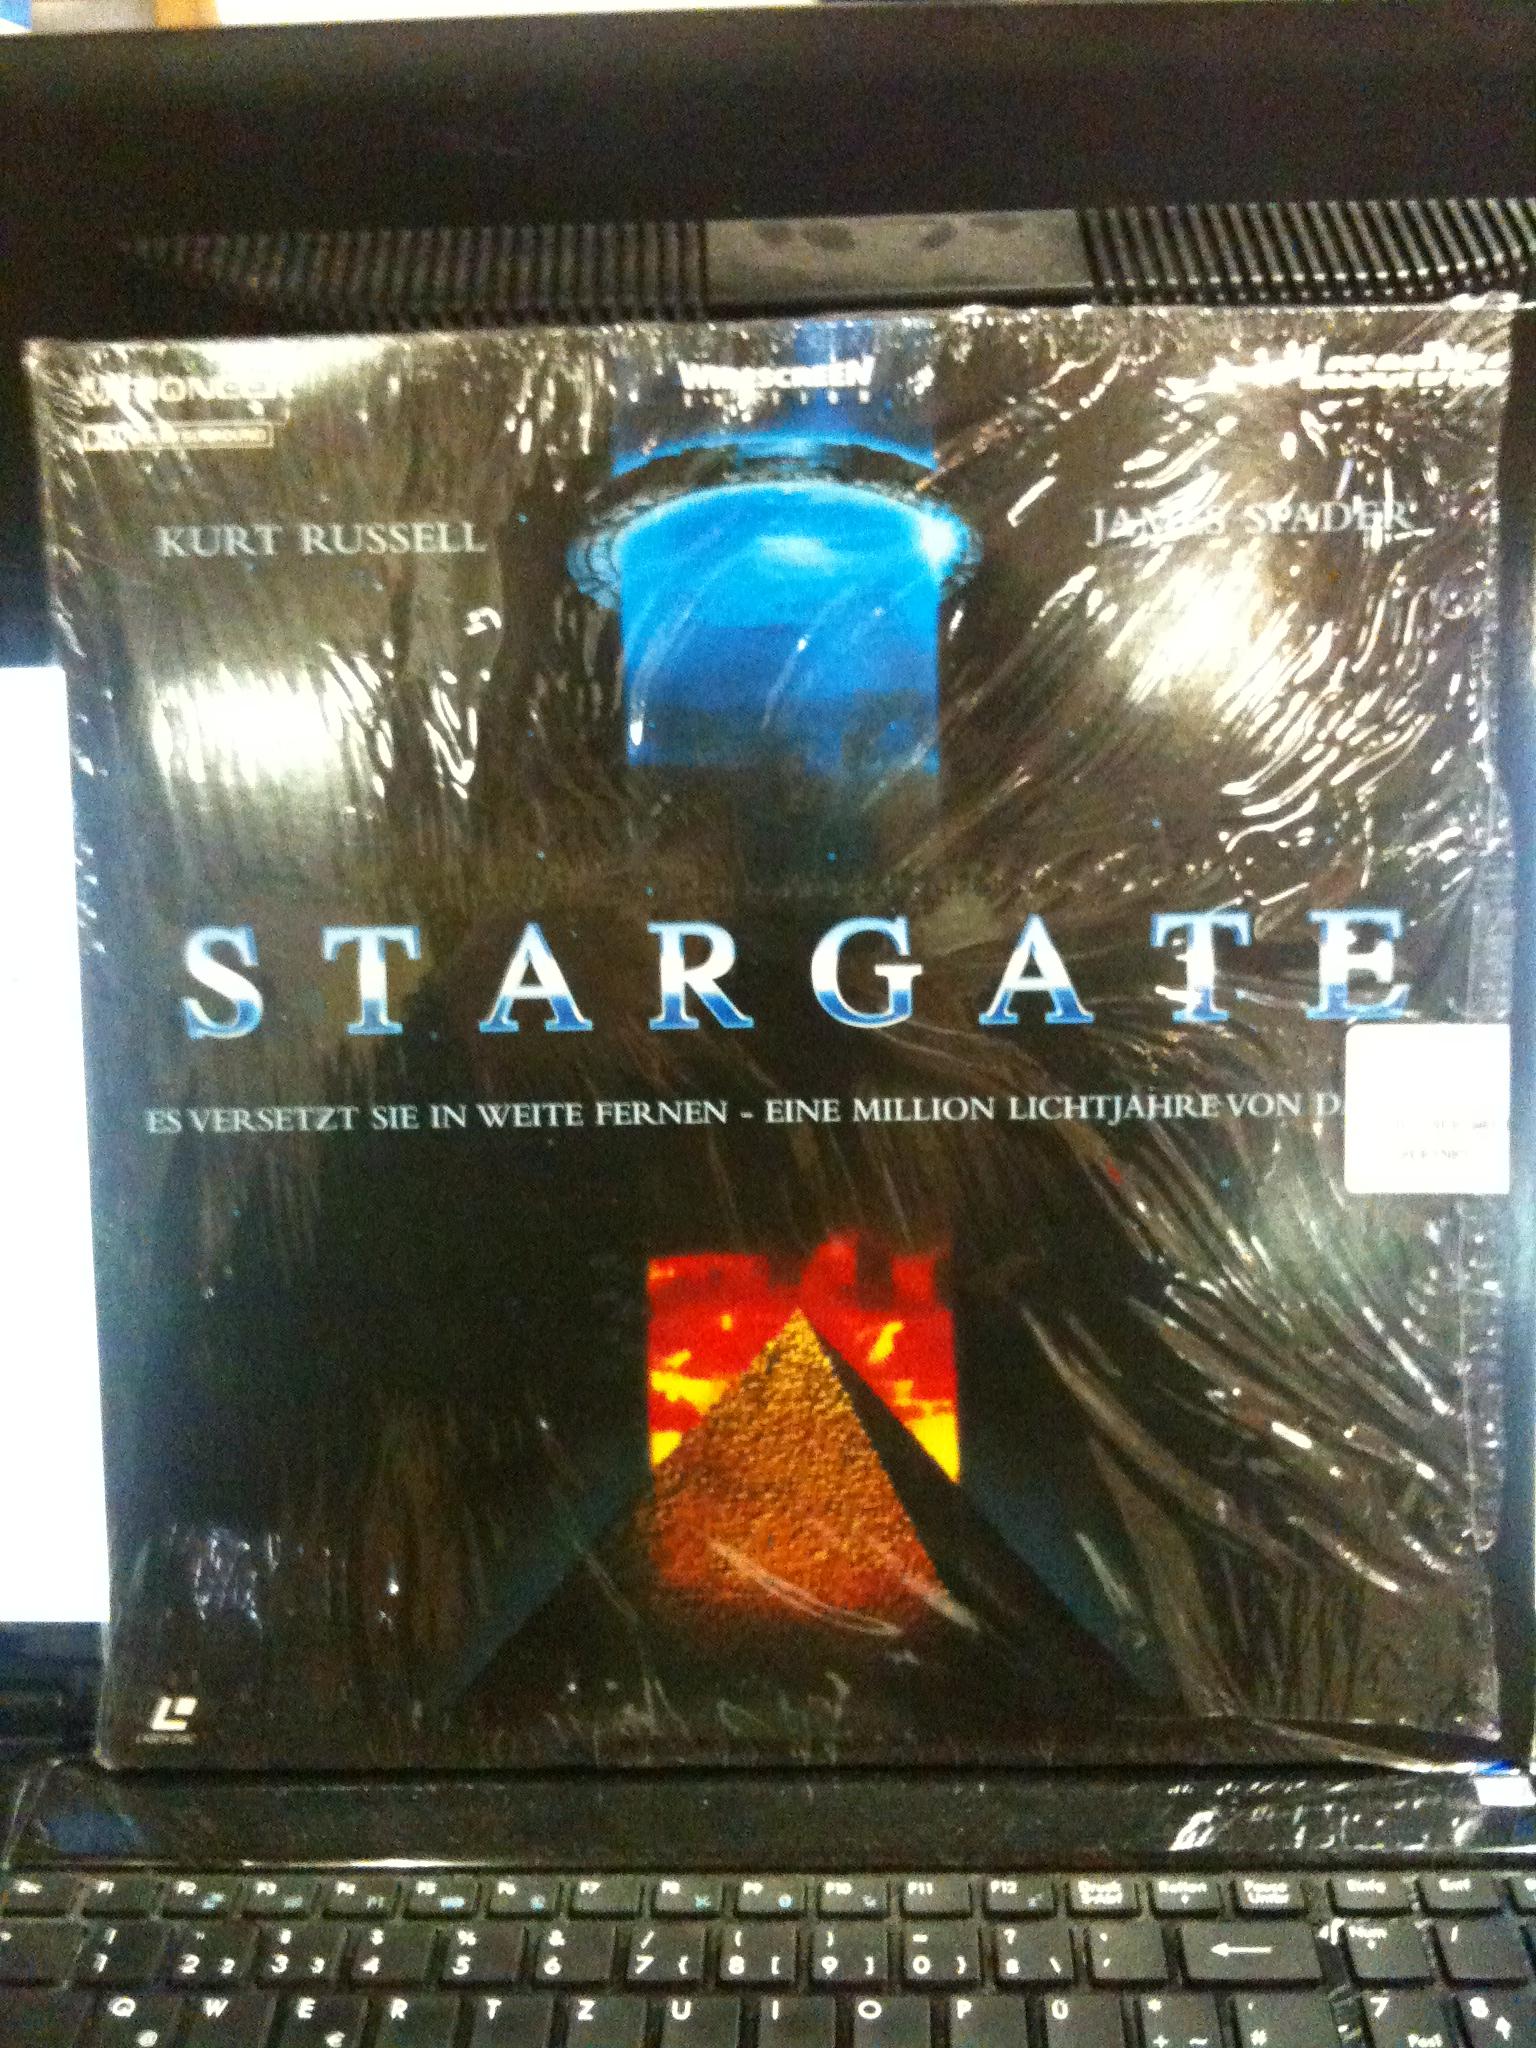 Stargate [LASERDISC, Widescreen, PAL, Dolby-Surround].